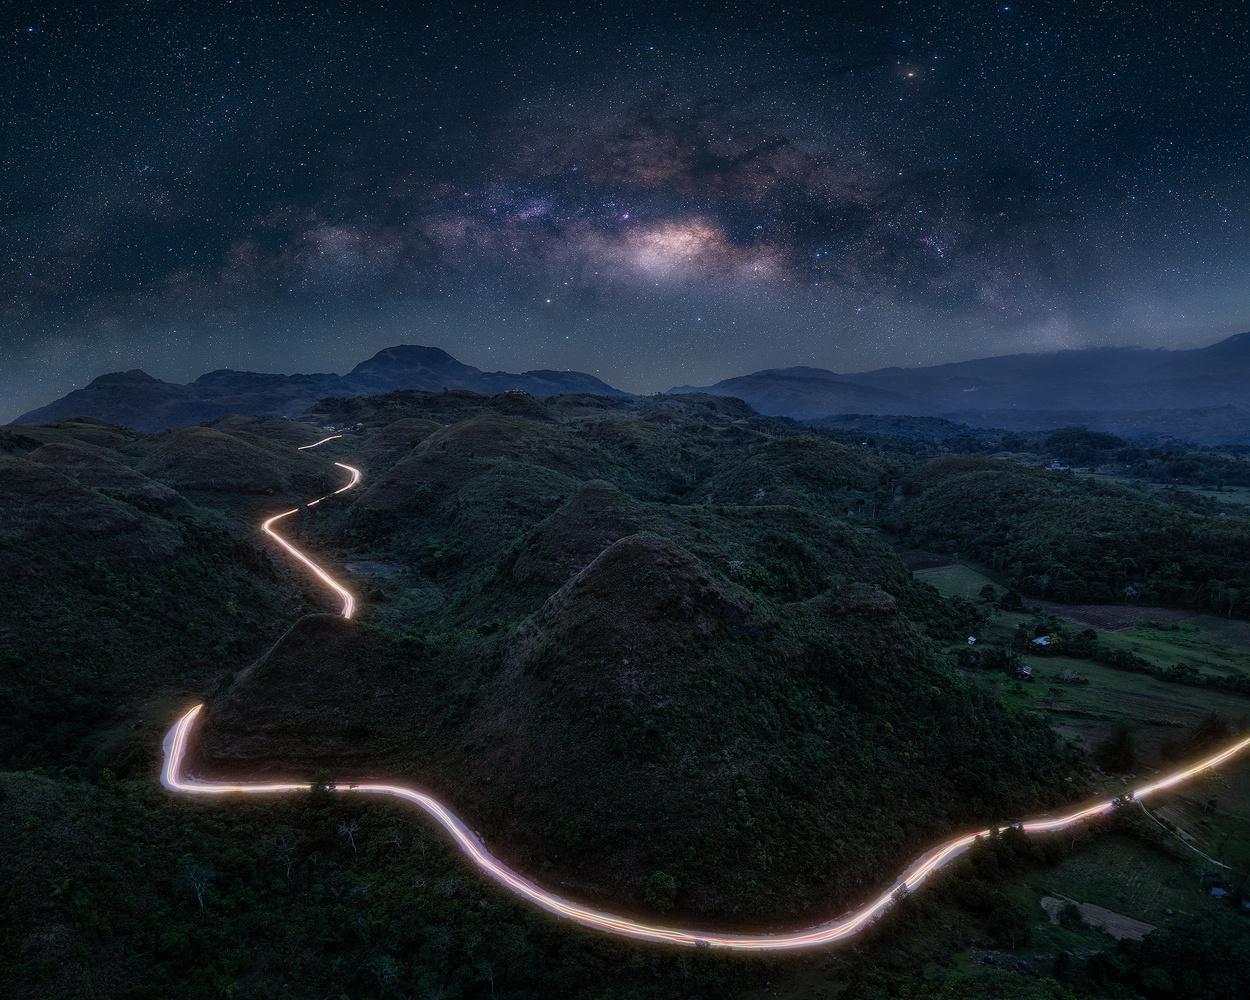 Mystical Hills of Hinakpan by John Kimwell Laluma